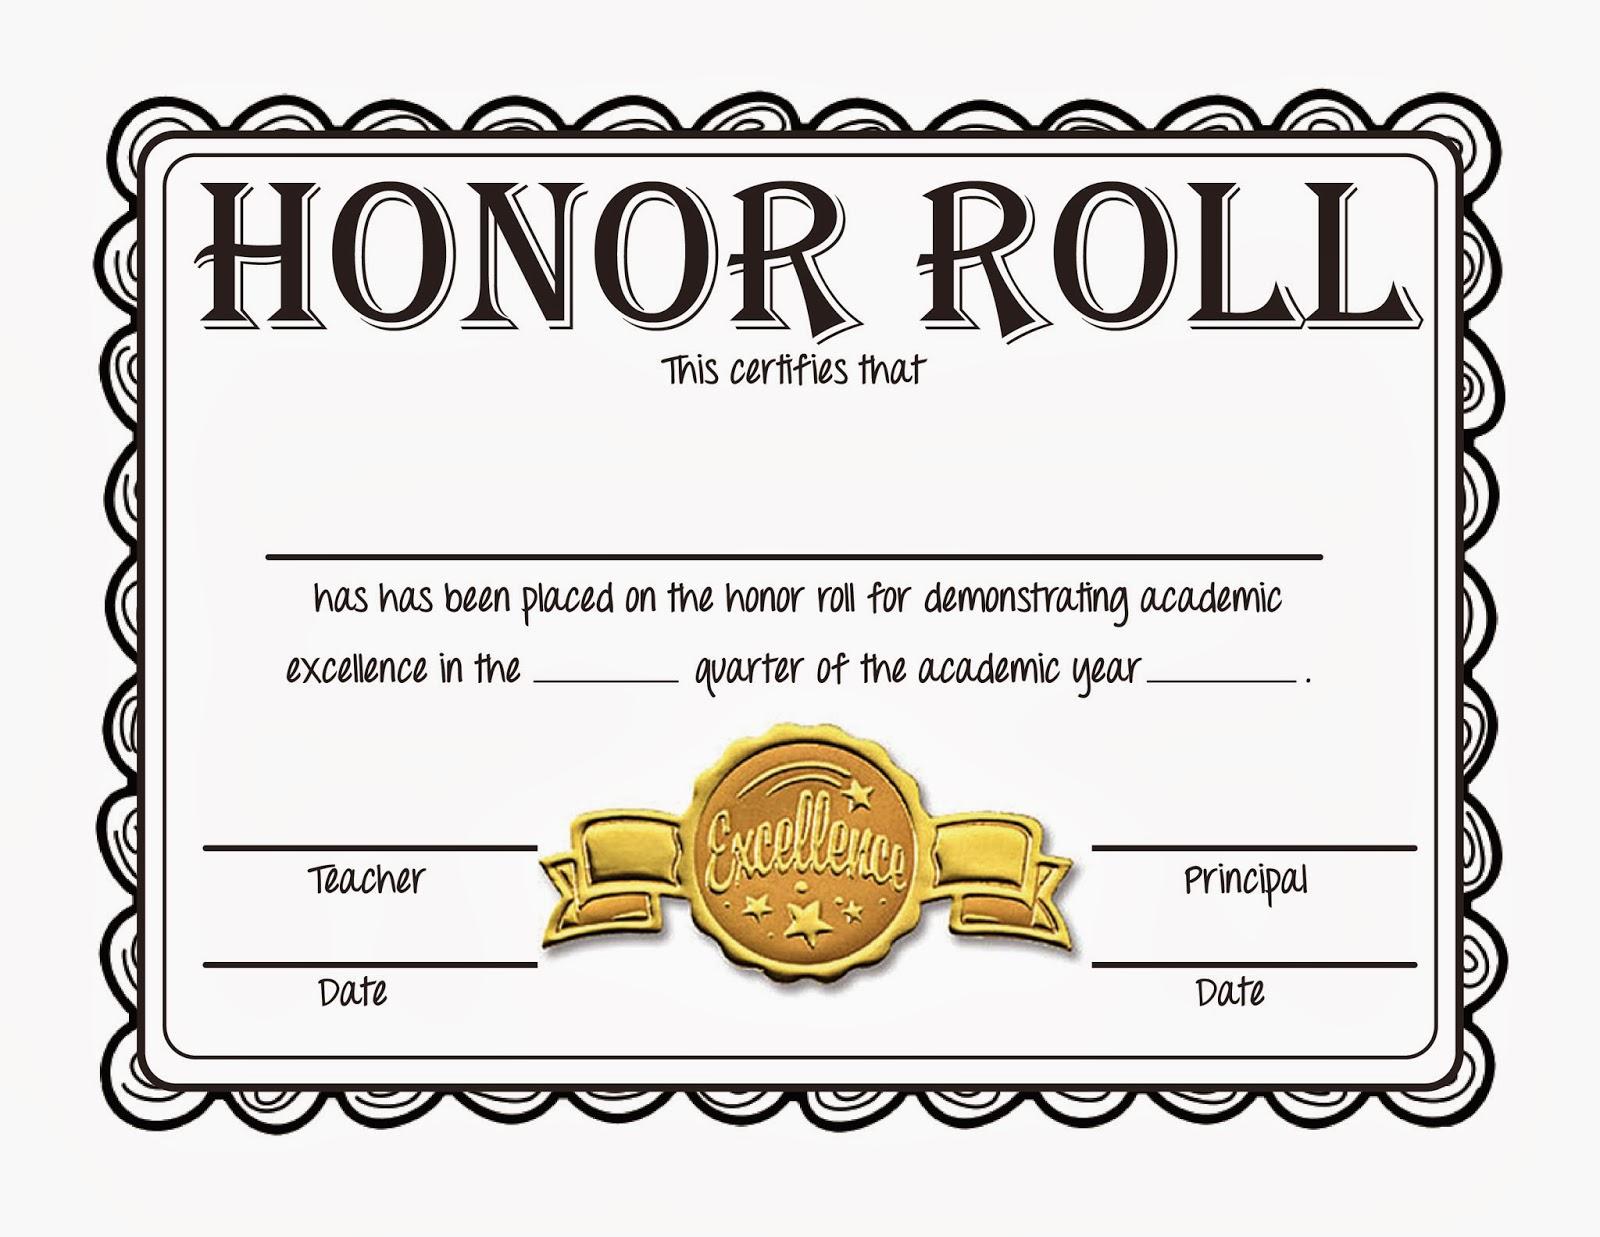 Honor Roll Certificate Template Microsoft Word. Honor Roll Certificates  Template Free . Honor Roll Certificate Template Microsoft Word  Microsoft Word Certificates